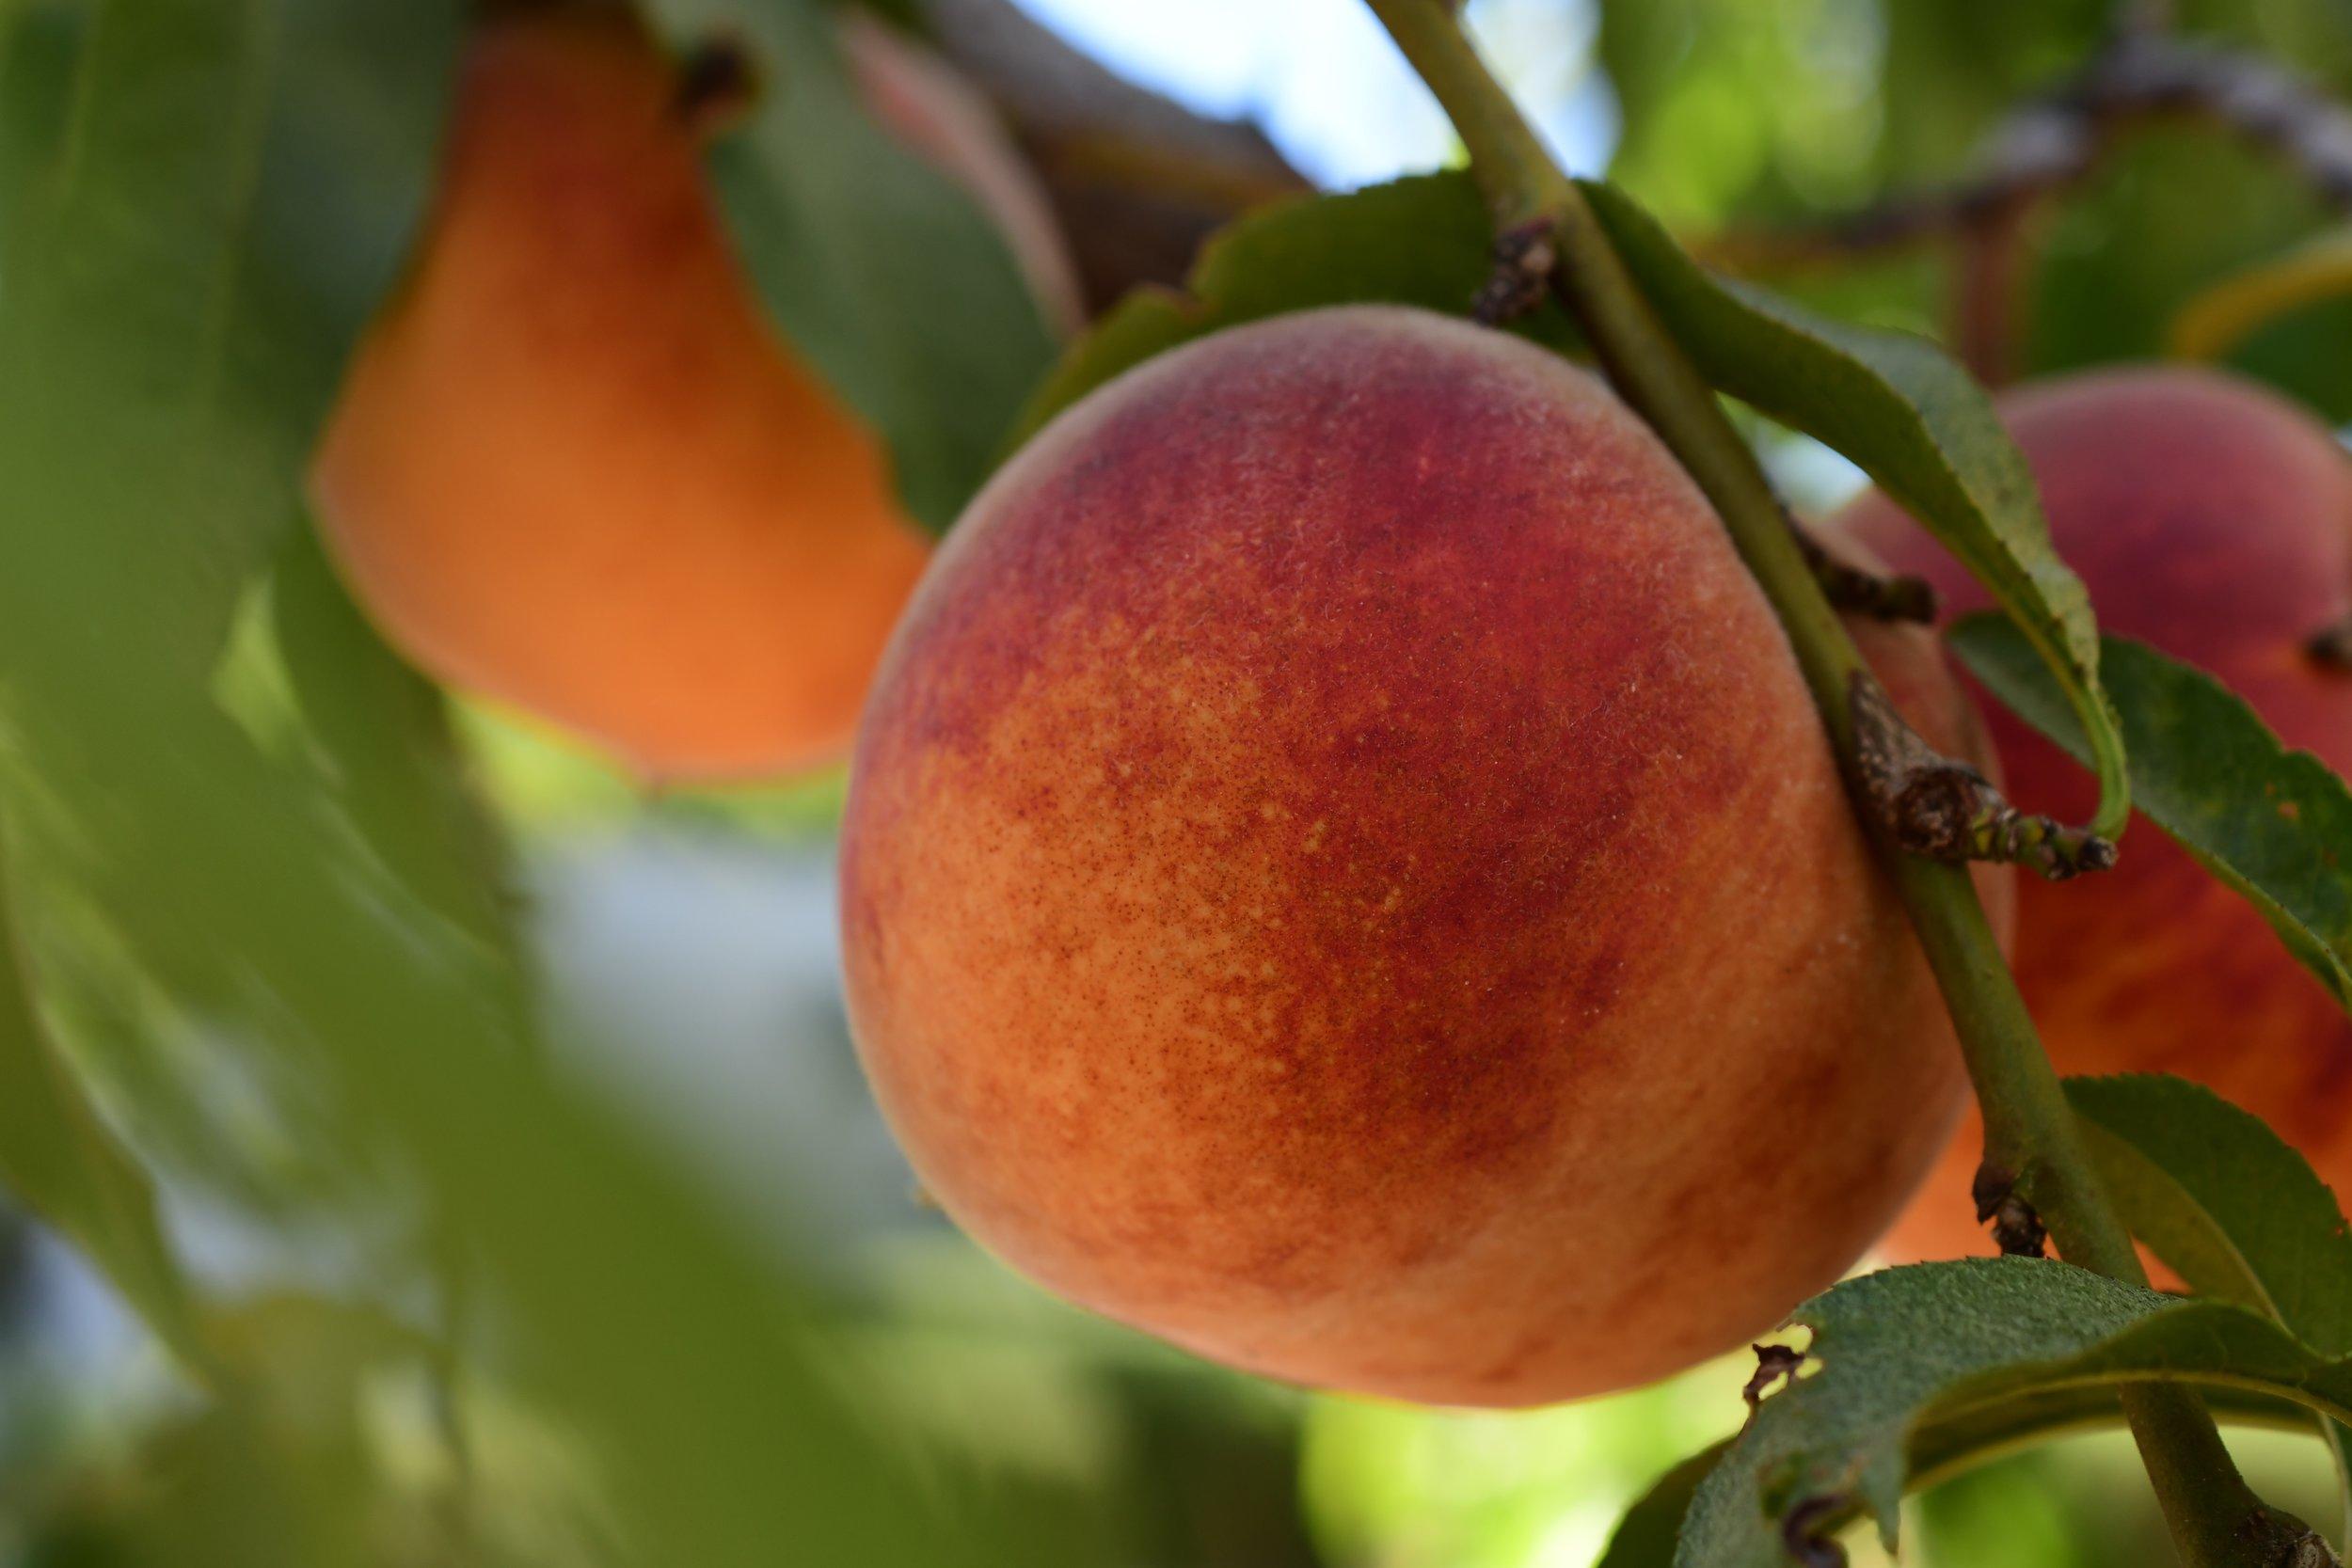 Peach on Tree Branch.jpg